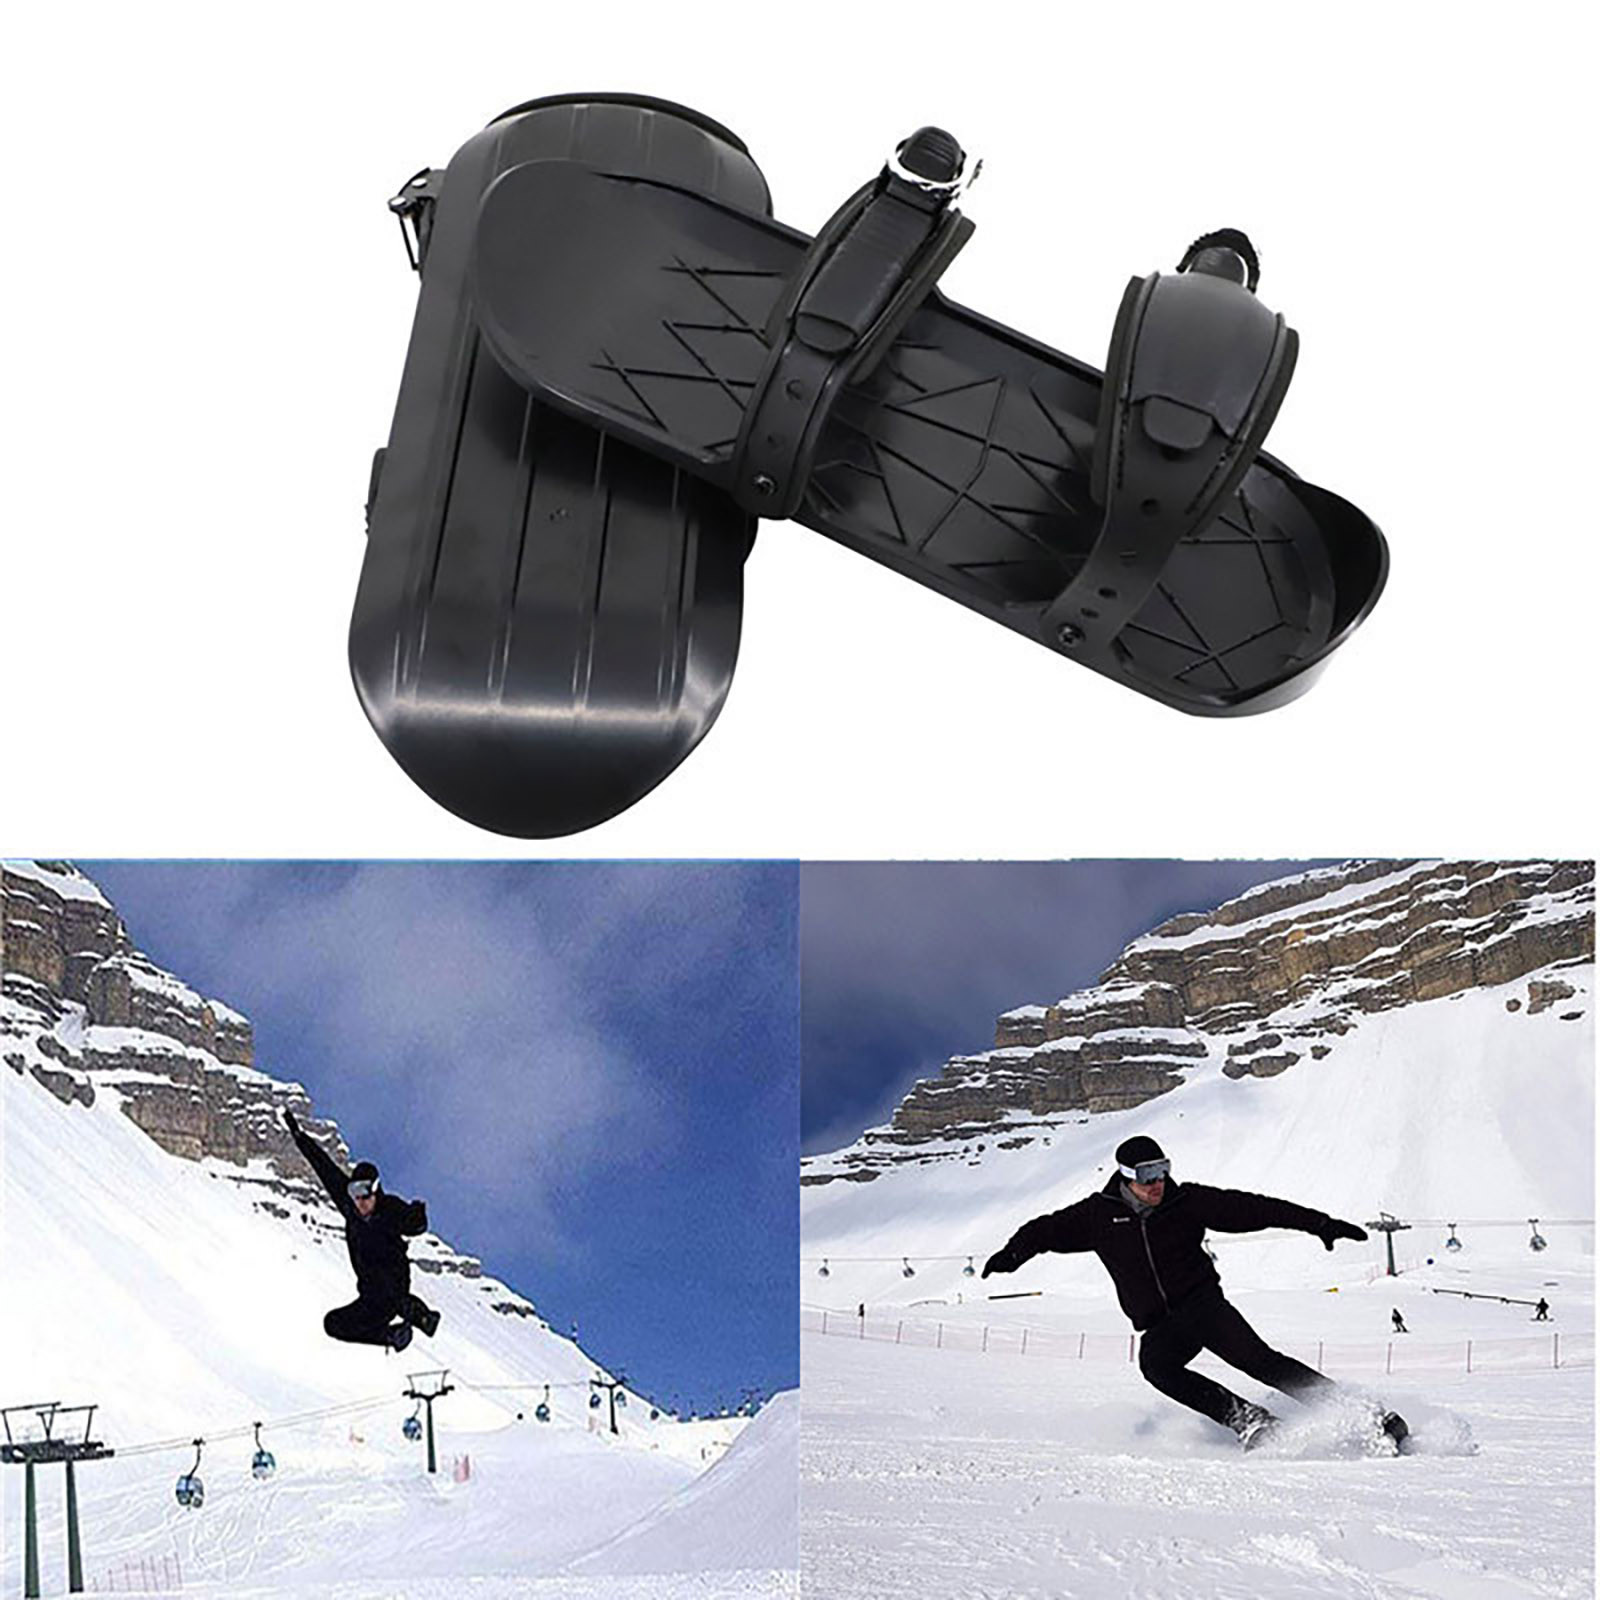 Skiing-Shoes Boot Waterproof Snow-Feet Winter Snowboarding Adjustable Outdoor Attach